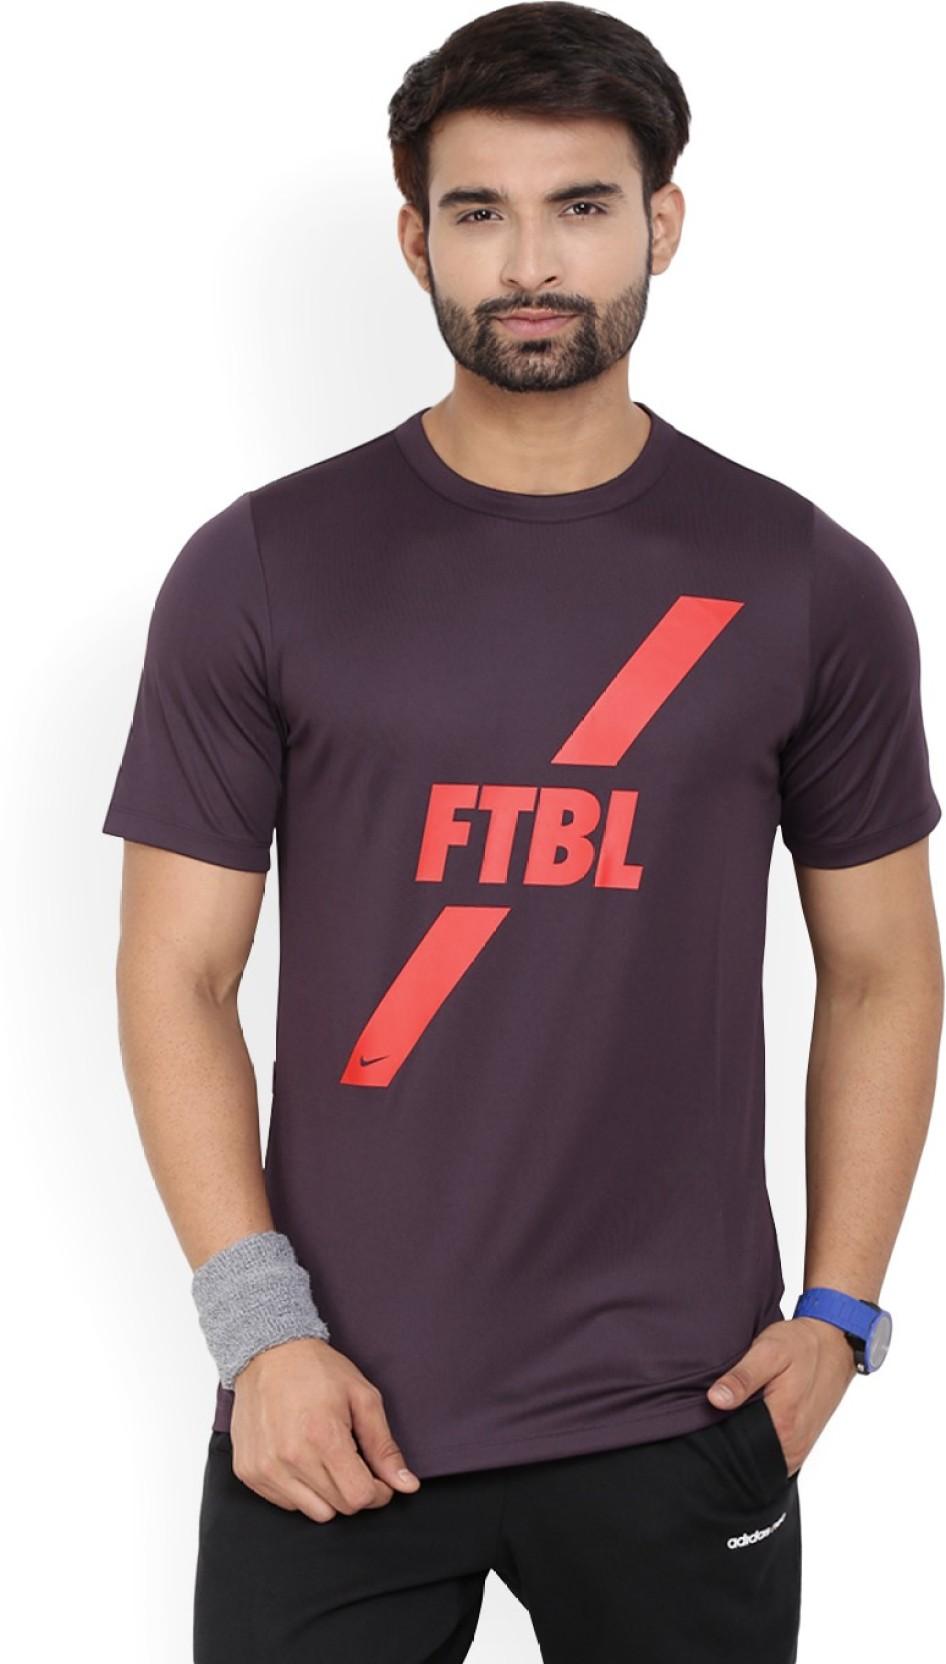 5cf725d25 Nike Sweatshirts Buy Online India - DREAMWORKS